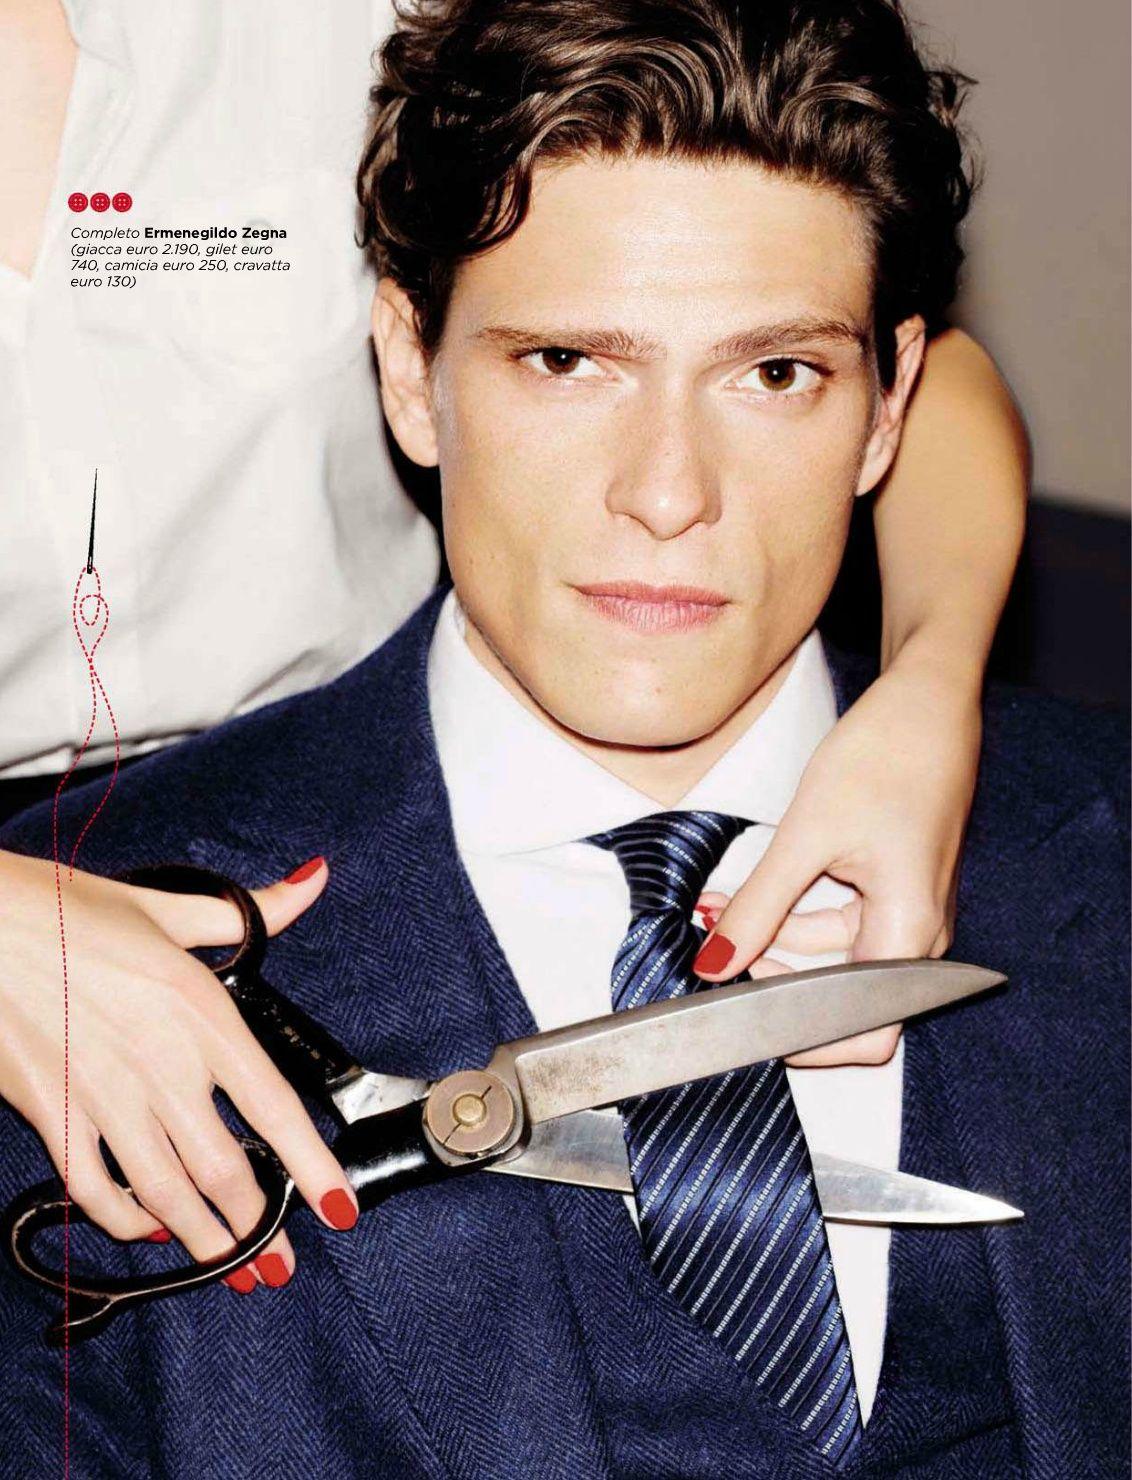 Matteo Martari Sports Tailored Suits for GQ Italia